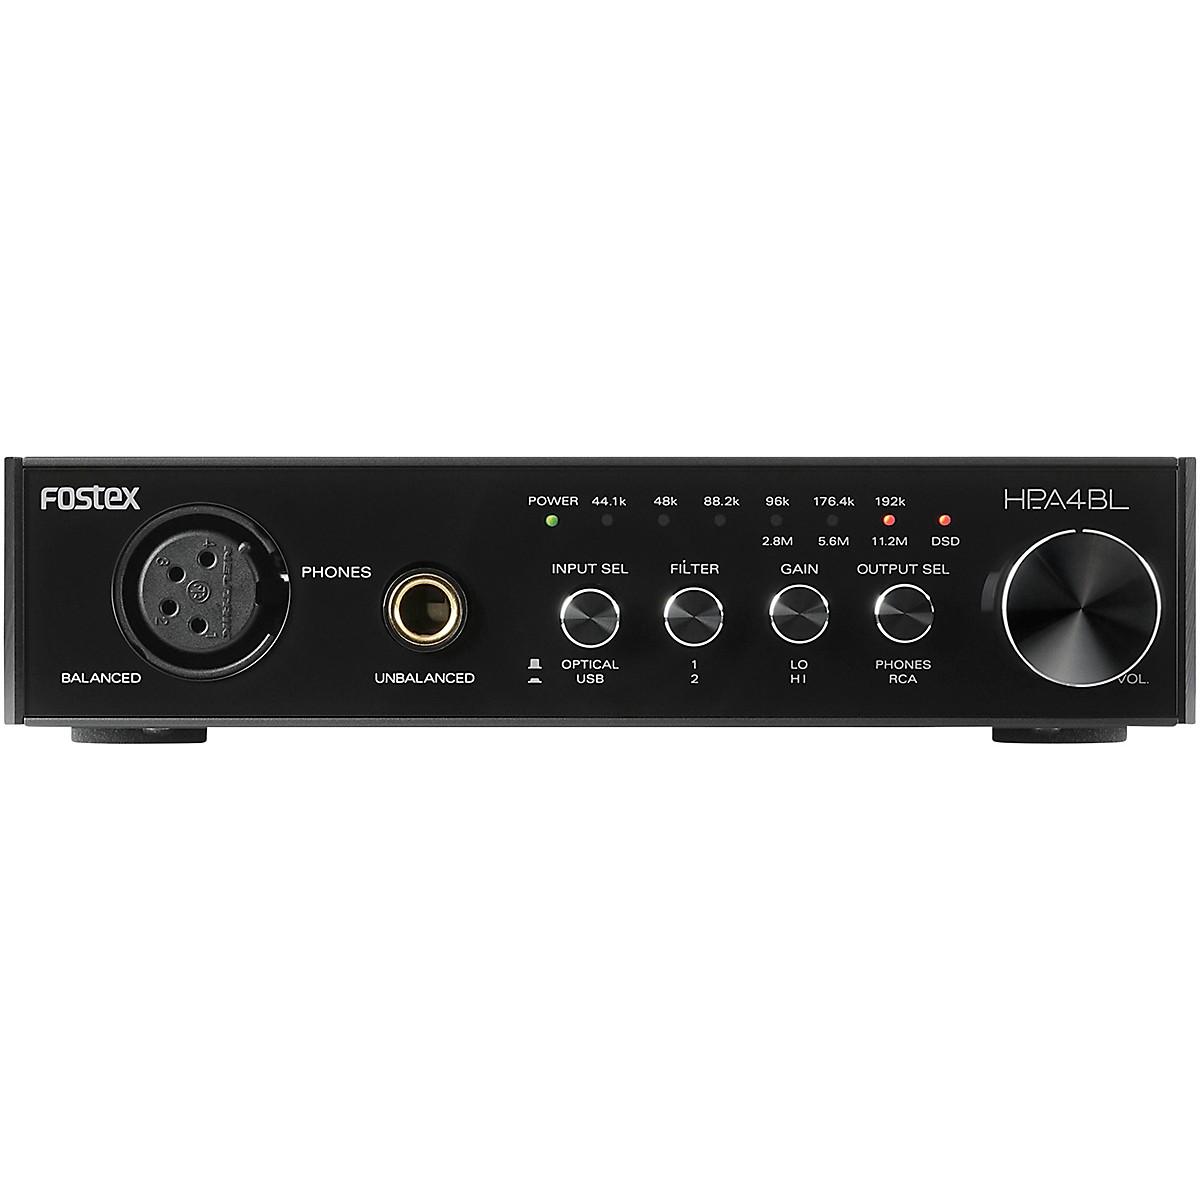 Fostex HP-A4BL DAC and Headphone Amp